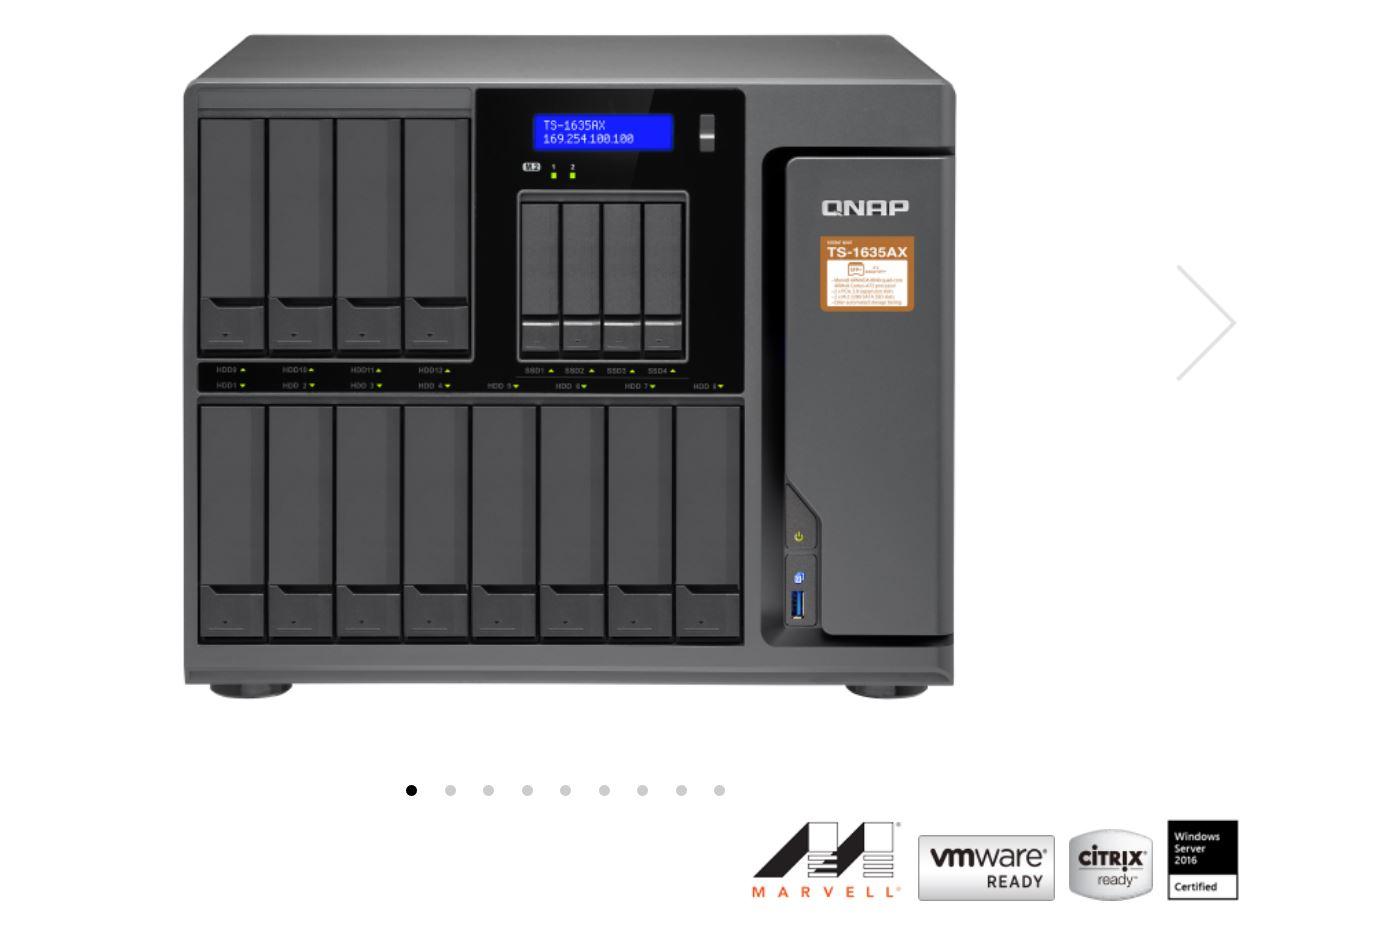 QNAP TS-1635AX-8G 16 BAY NAS (NO DISK), CORTEX-A72, 8GB,USB, GbE(2), 10GbE SFP+(2), Tower, 2 Years warranty